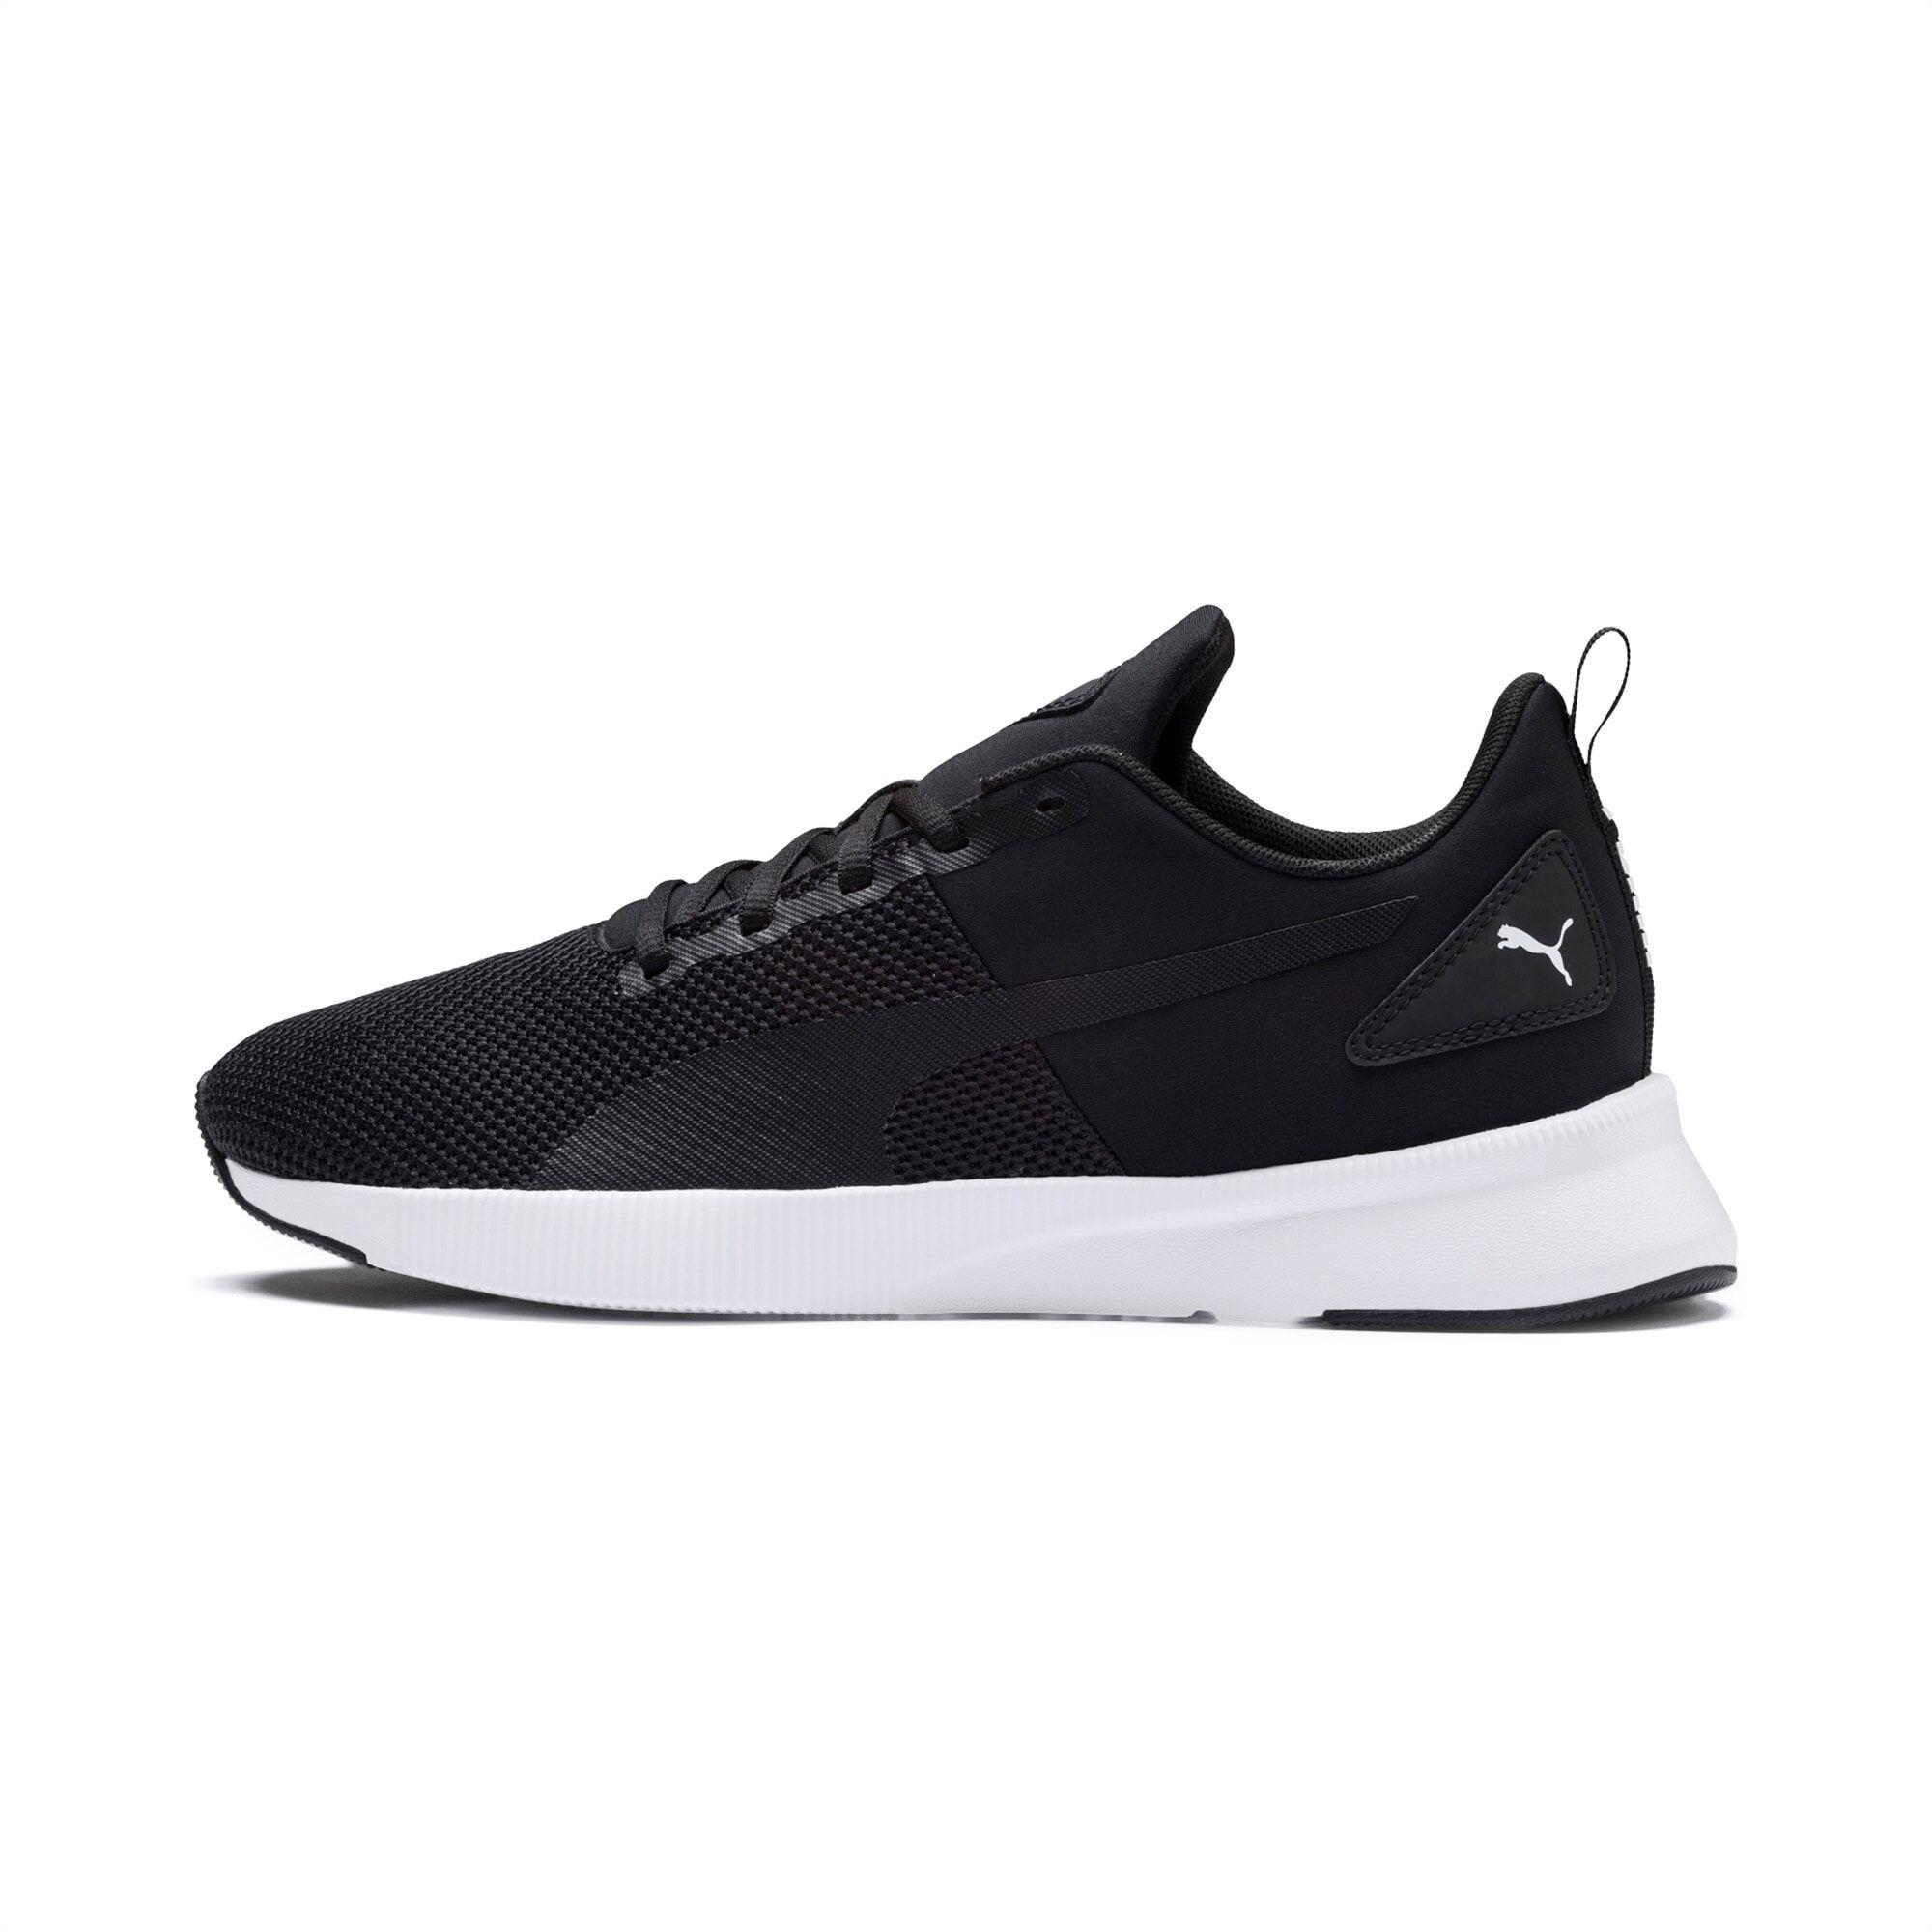 PUMA Chaussure de course Flyer Runner, Noir/Blanc, Taille 40, Chaussures